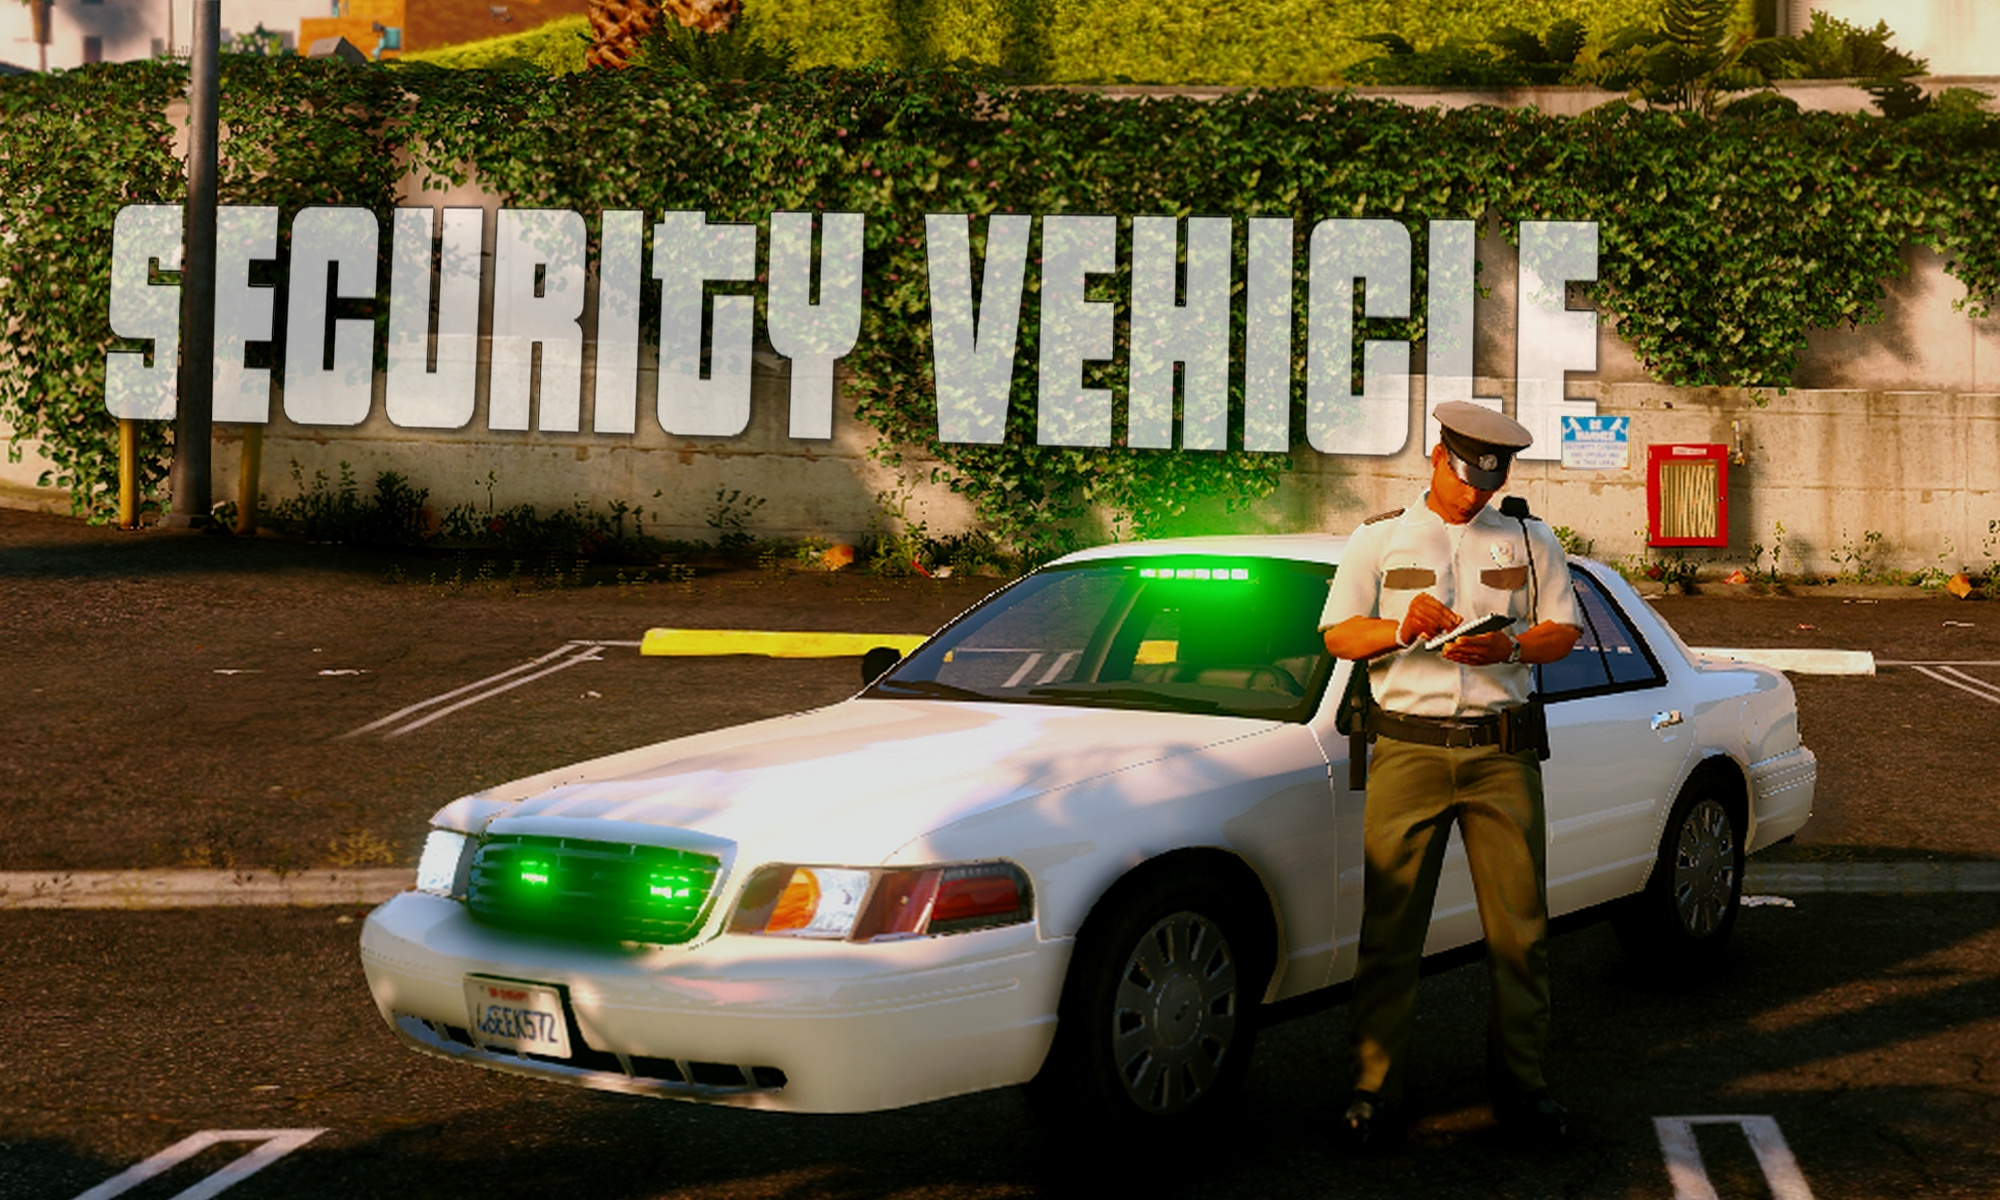 Security crown victoria green lights gta5 mods e90a9e untitled 5 aloadofball Gallery